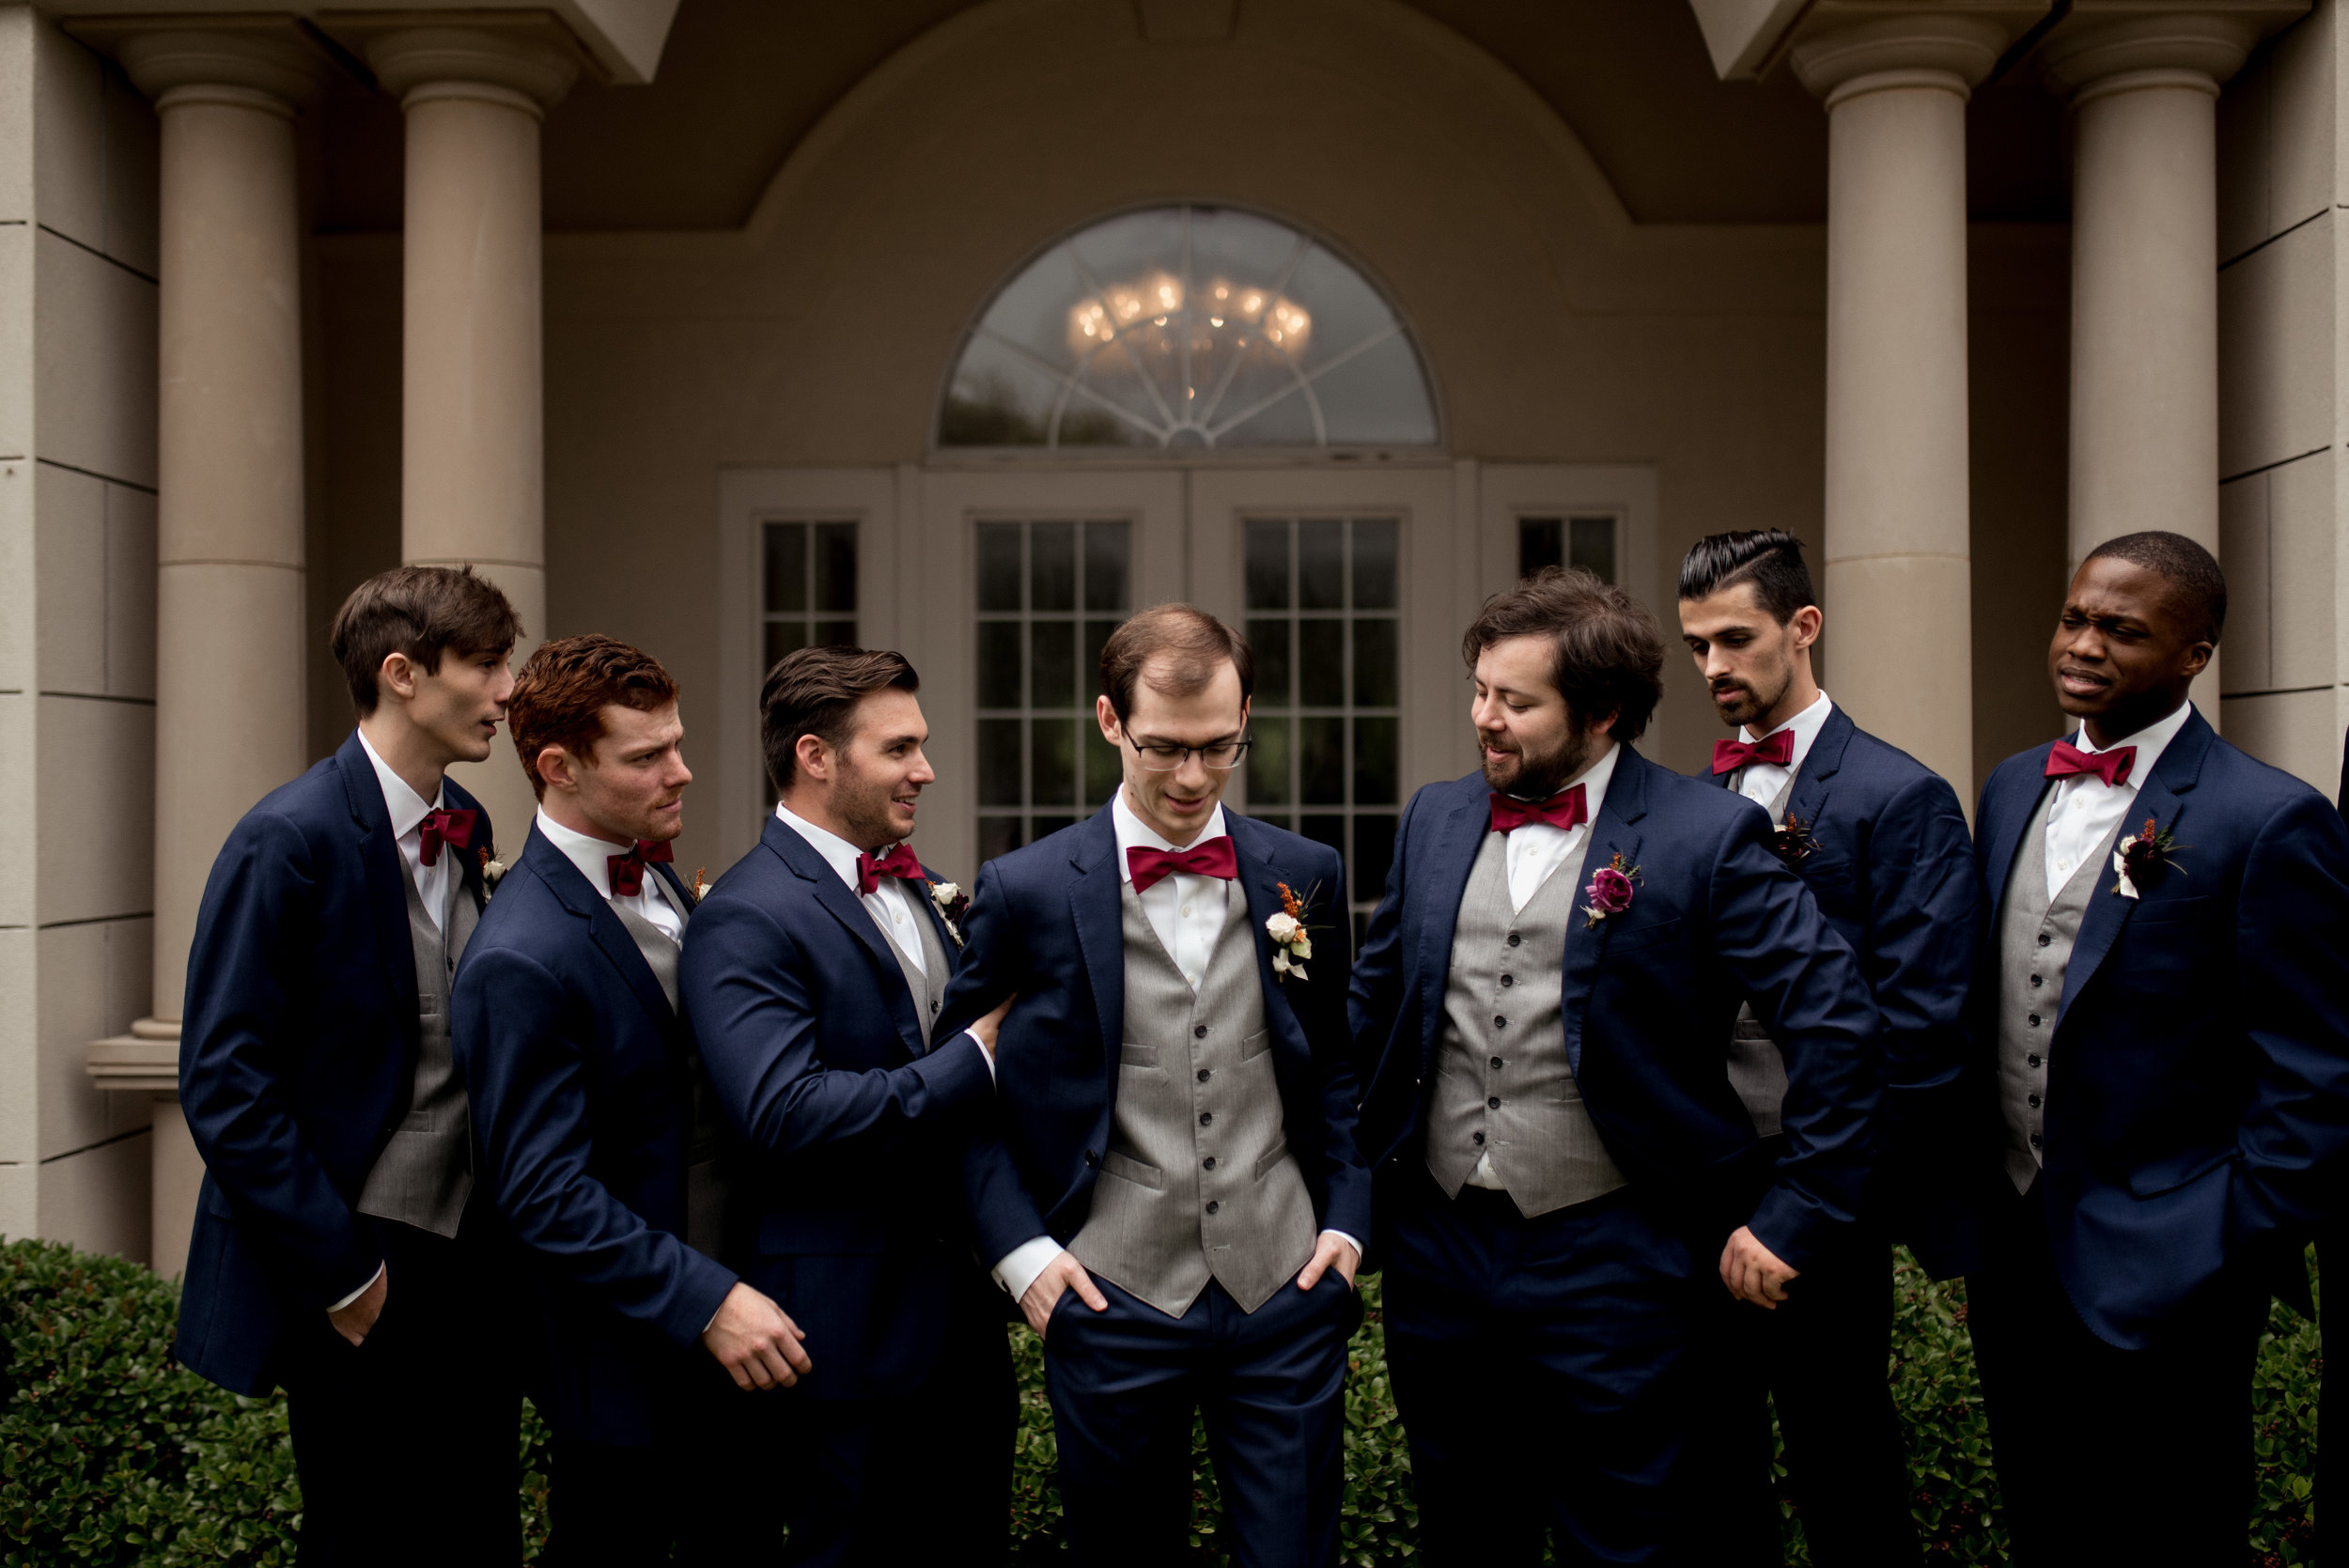 Artigues Wedding-163.jpg